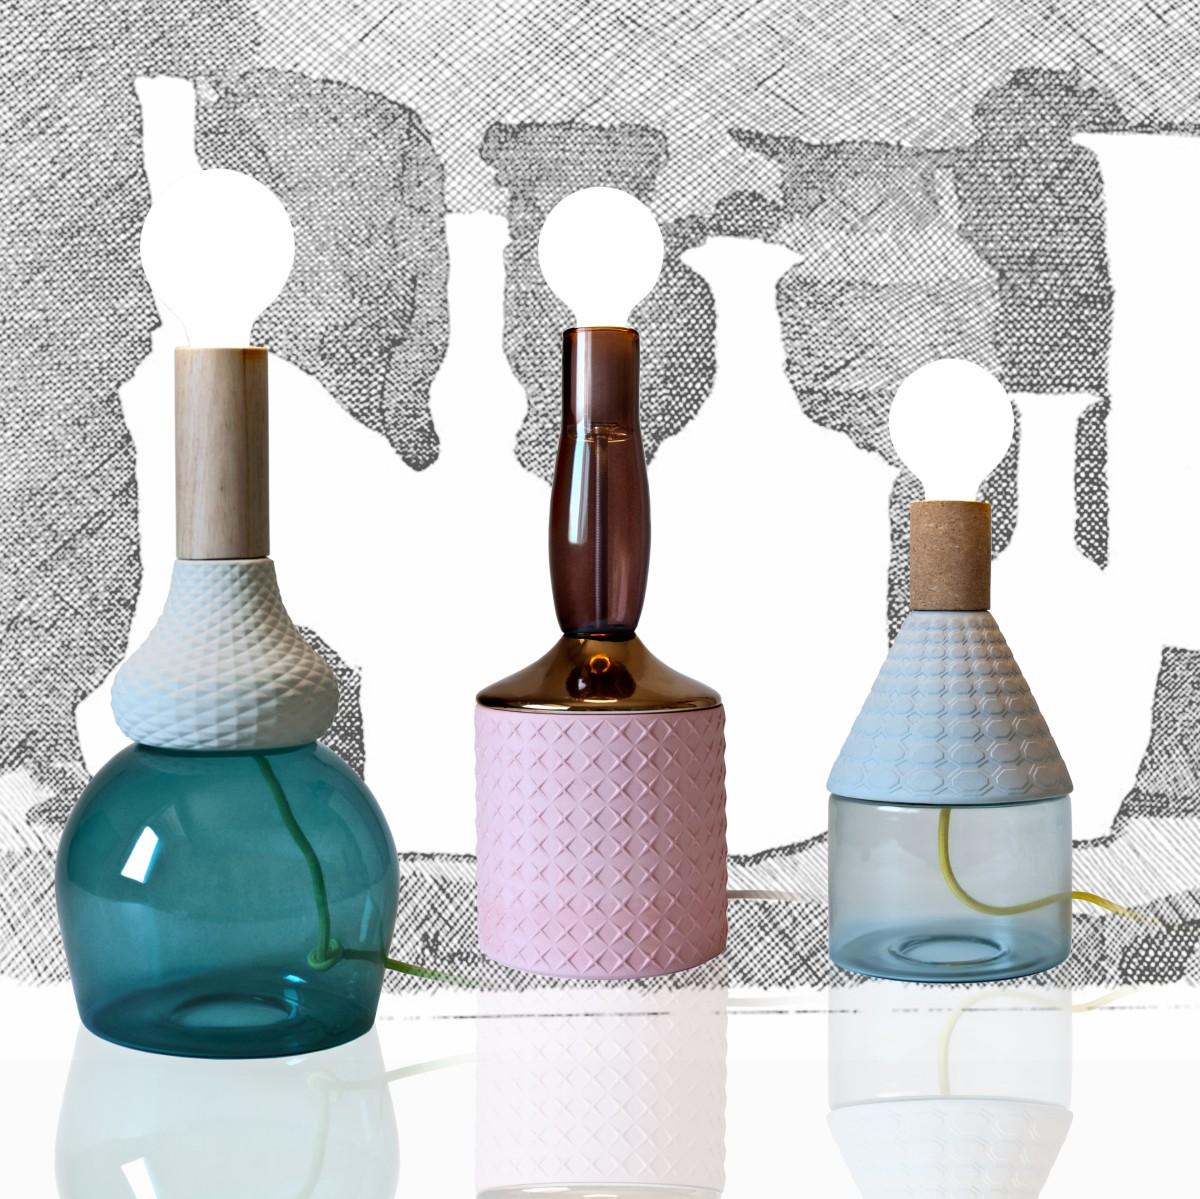 Idee regalo Natale 2015, MRND Anna, Dina, Maria Teresa, Design Elena Salmistraro